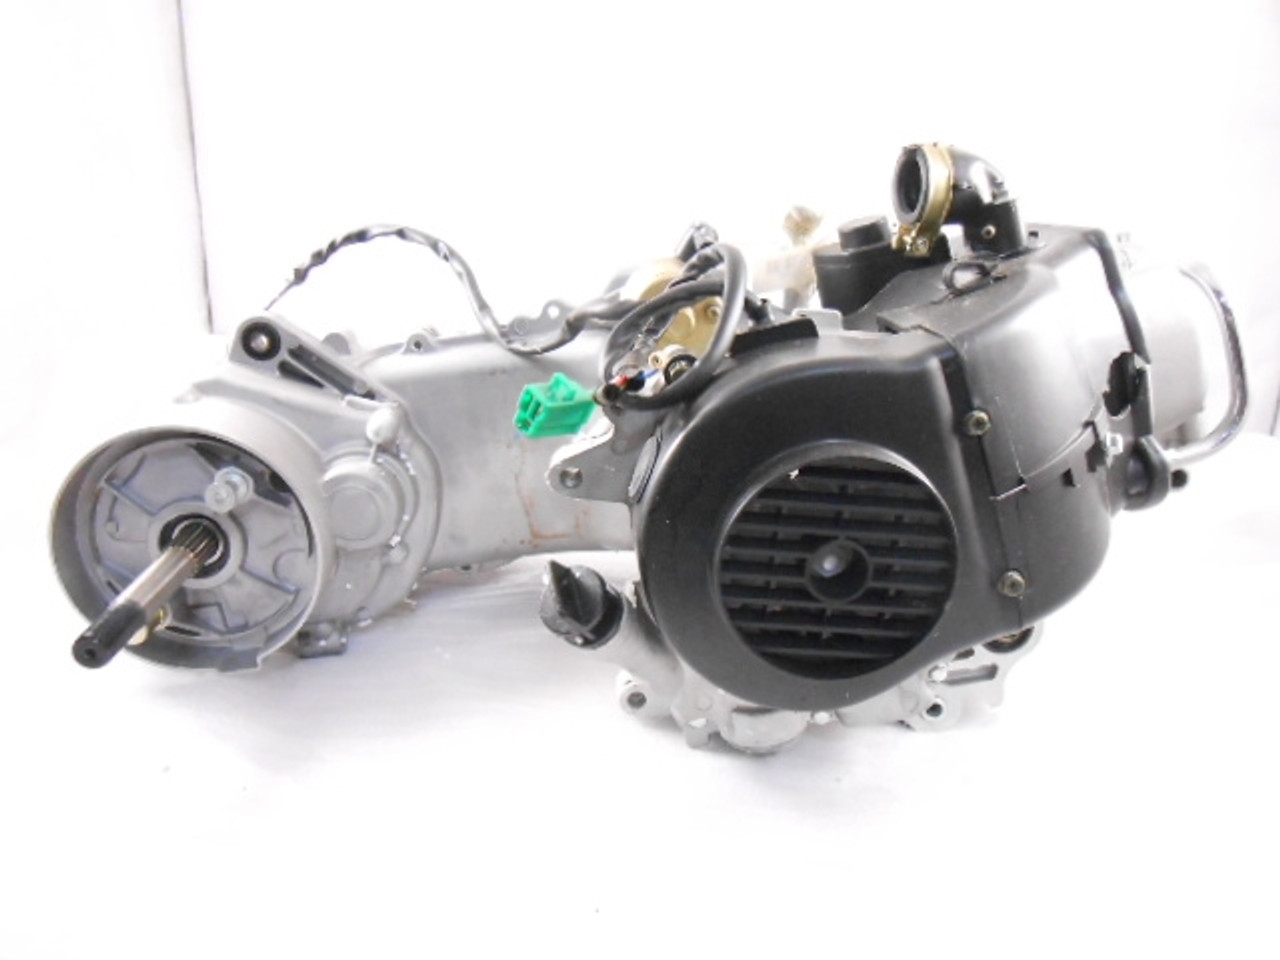 engine 50 cc long shaft 90058-9005-1